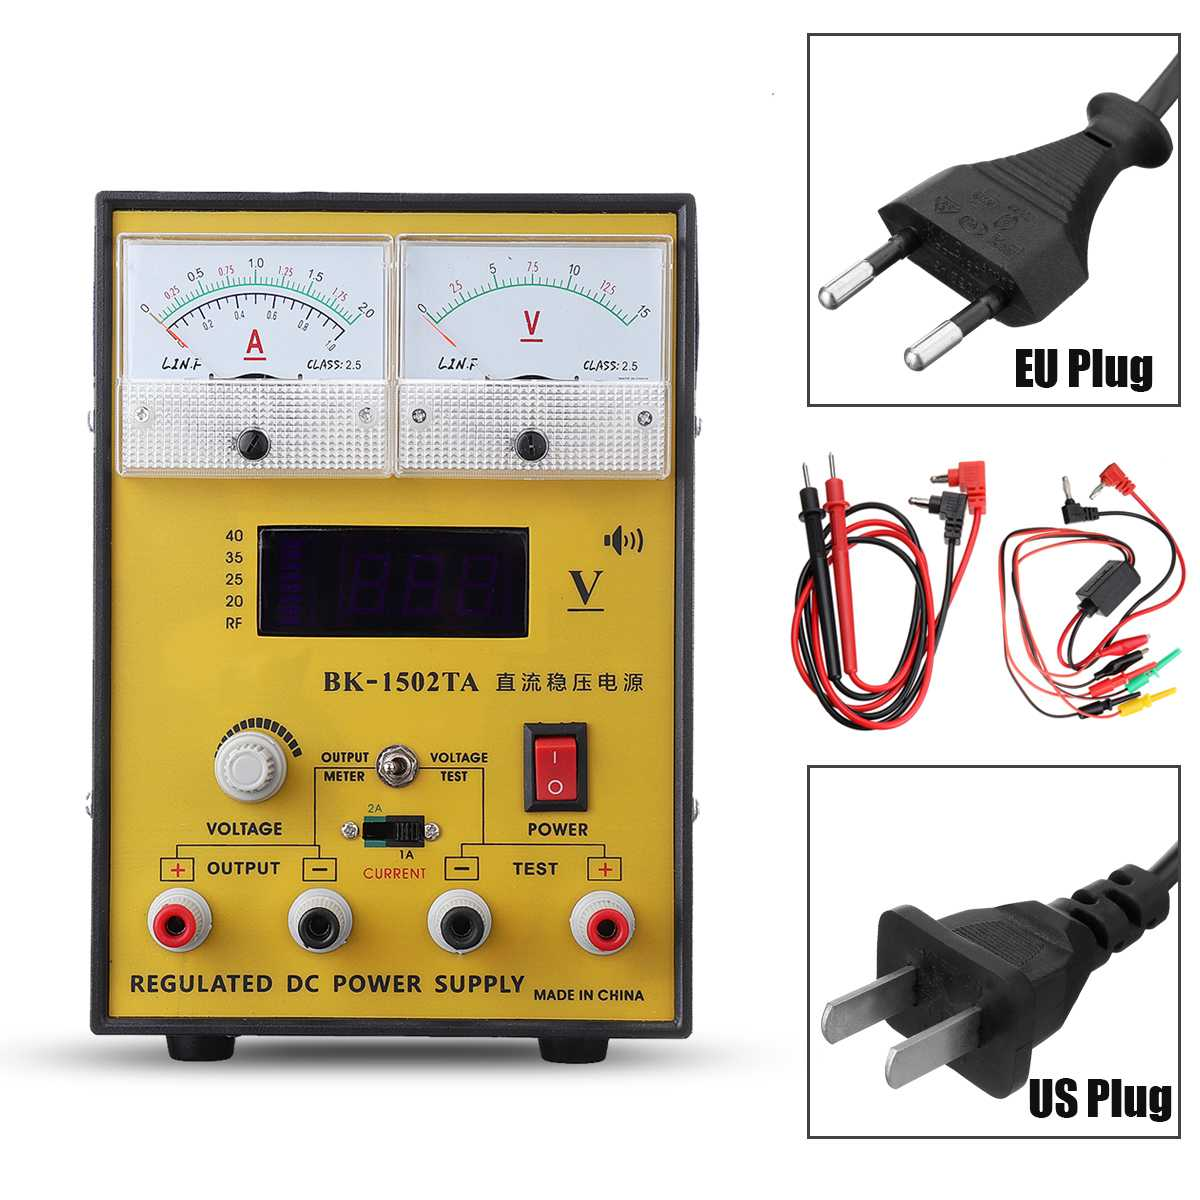 110V/220V 15V 2A Portable Digital LED DC Power Supply Adjustable Regulator EU Plug/US Plug Power Supply110V/220V 15V 2A Portable Digital LED DC Power Supply Adjustable Regulator EU Plug/US Plug Power Supply